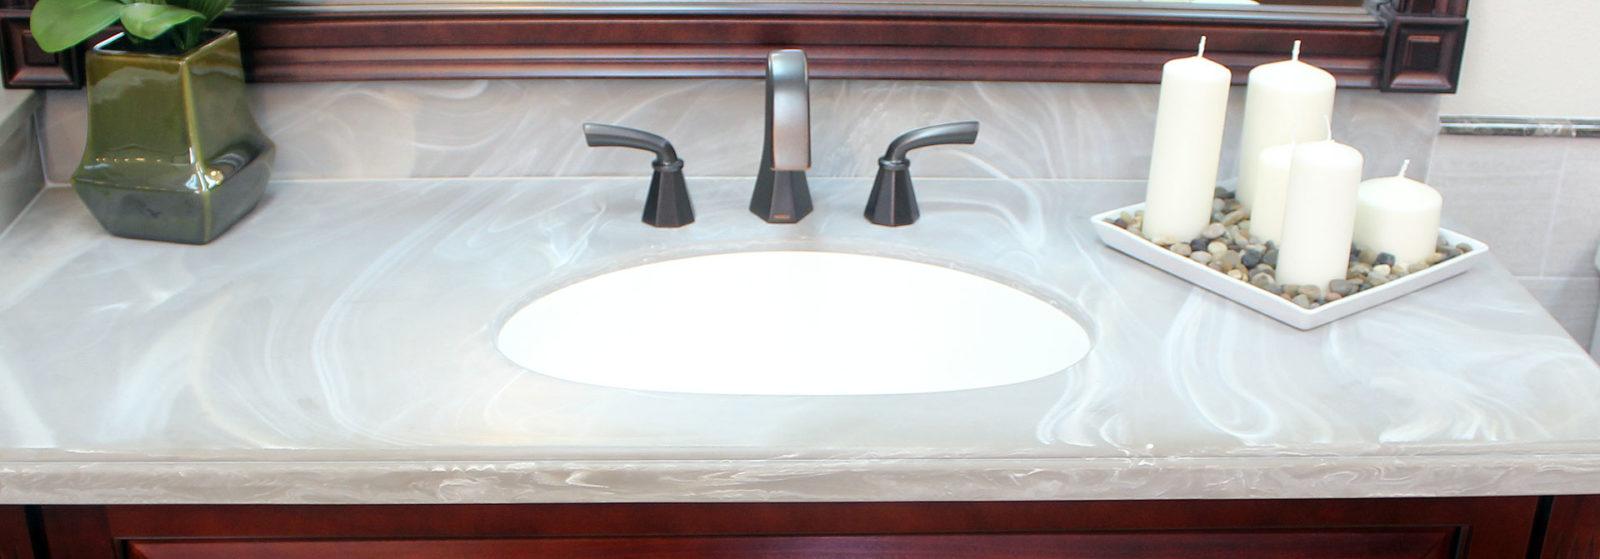 JettaStone Solid Surface Granite Showers & Baths - What is JettaStone?